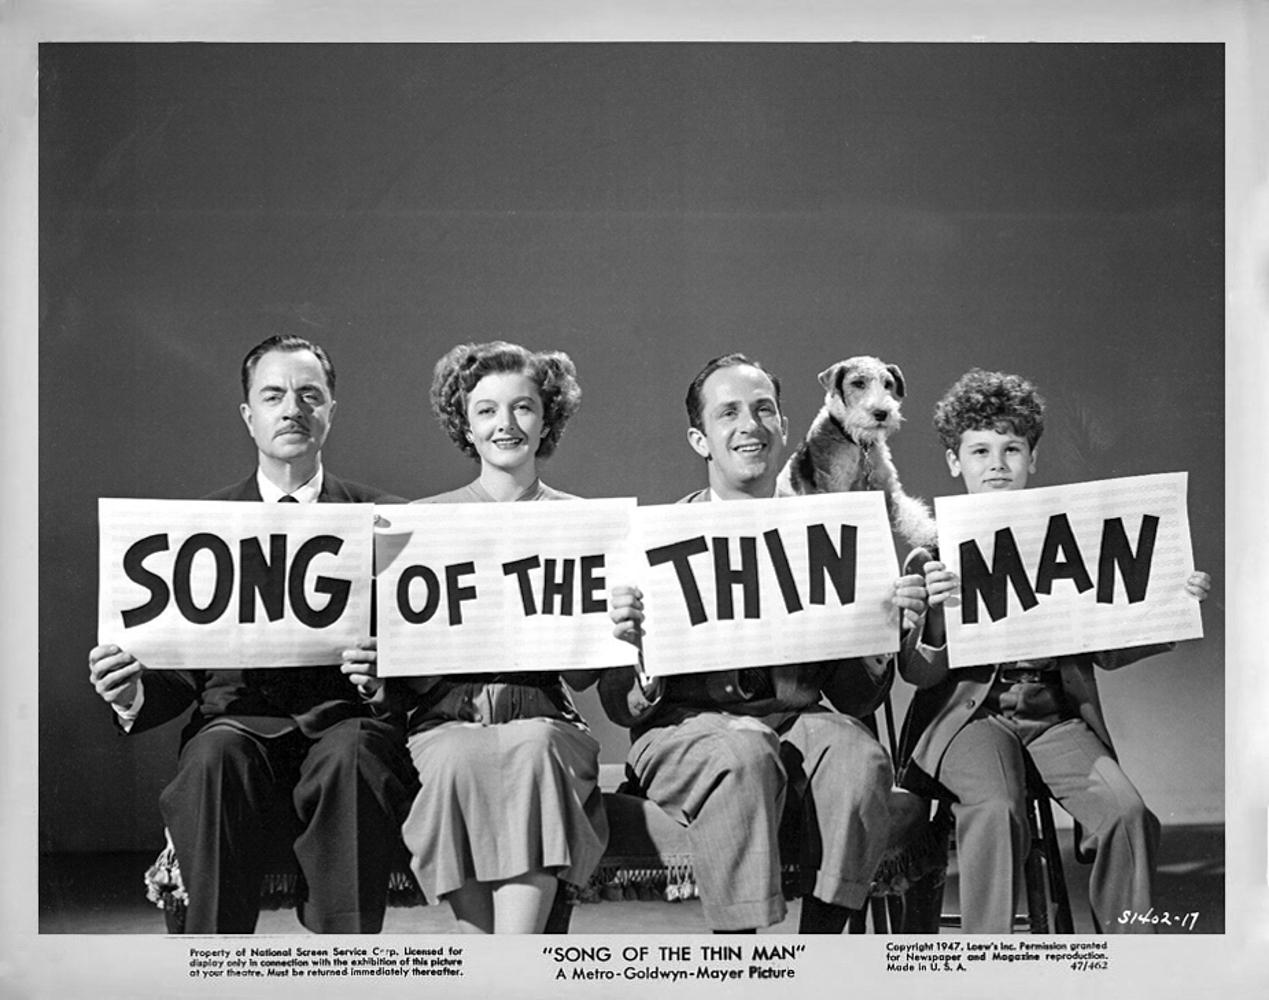 song of the thin man 1947 movie stills